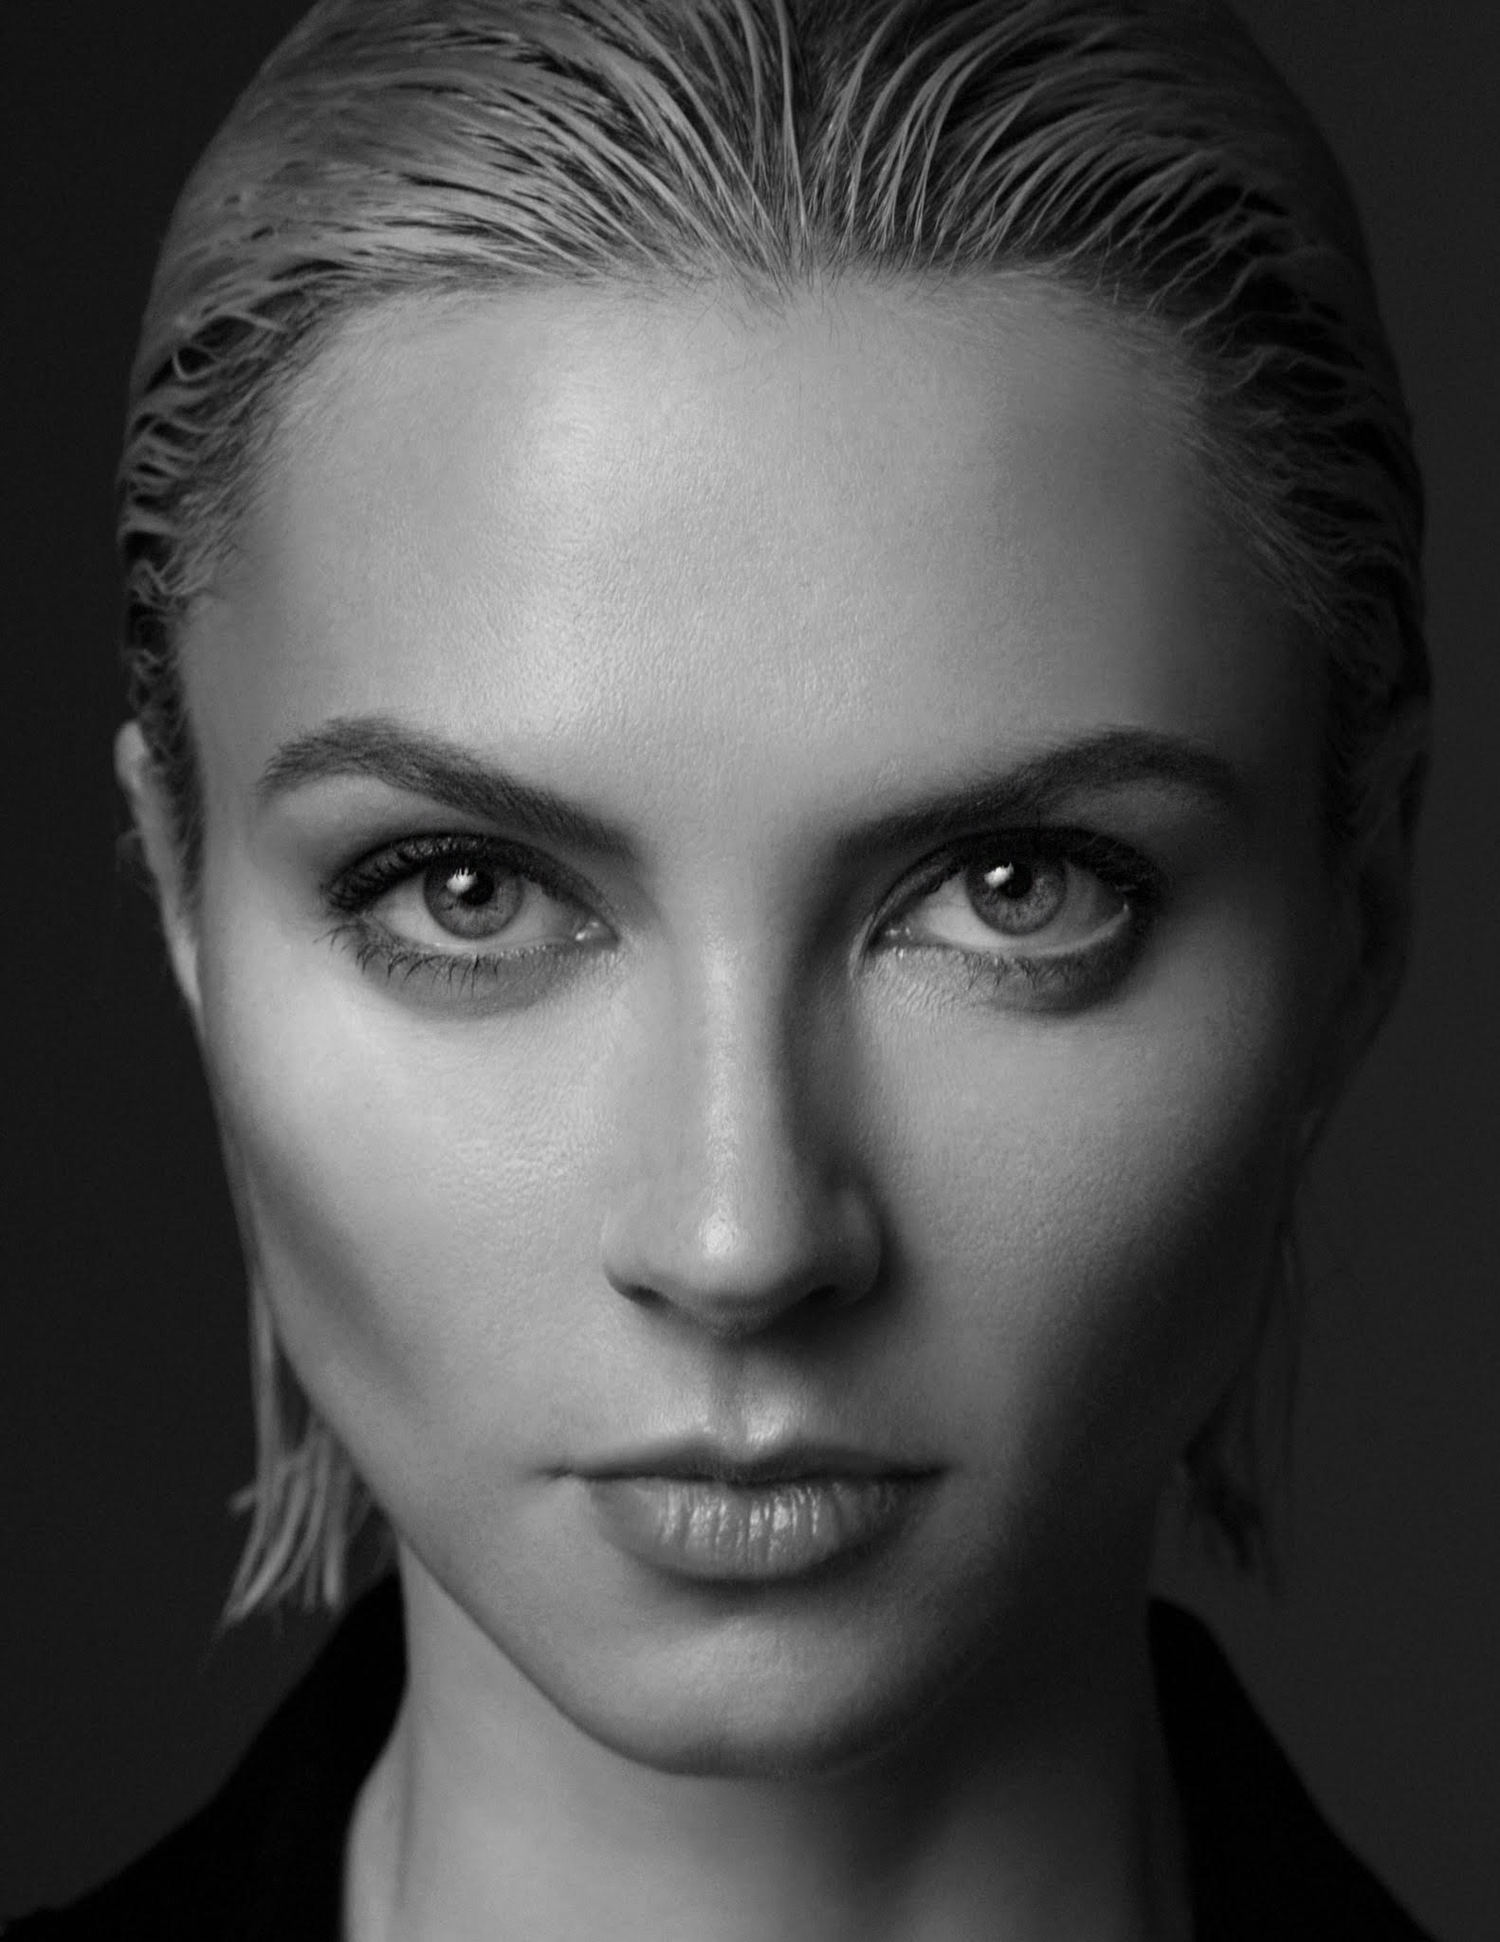 makeup-by-Mariana-Bull-06.jpg